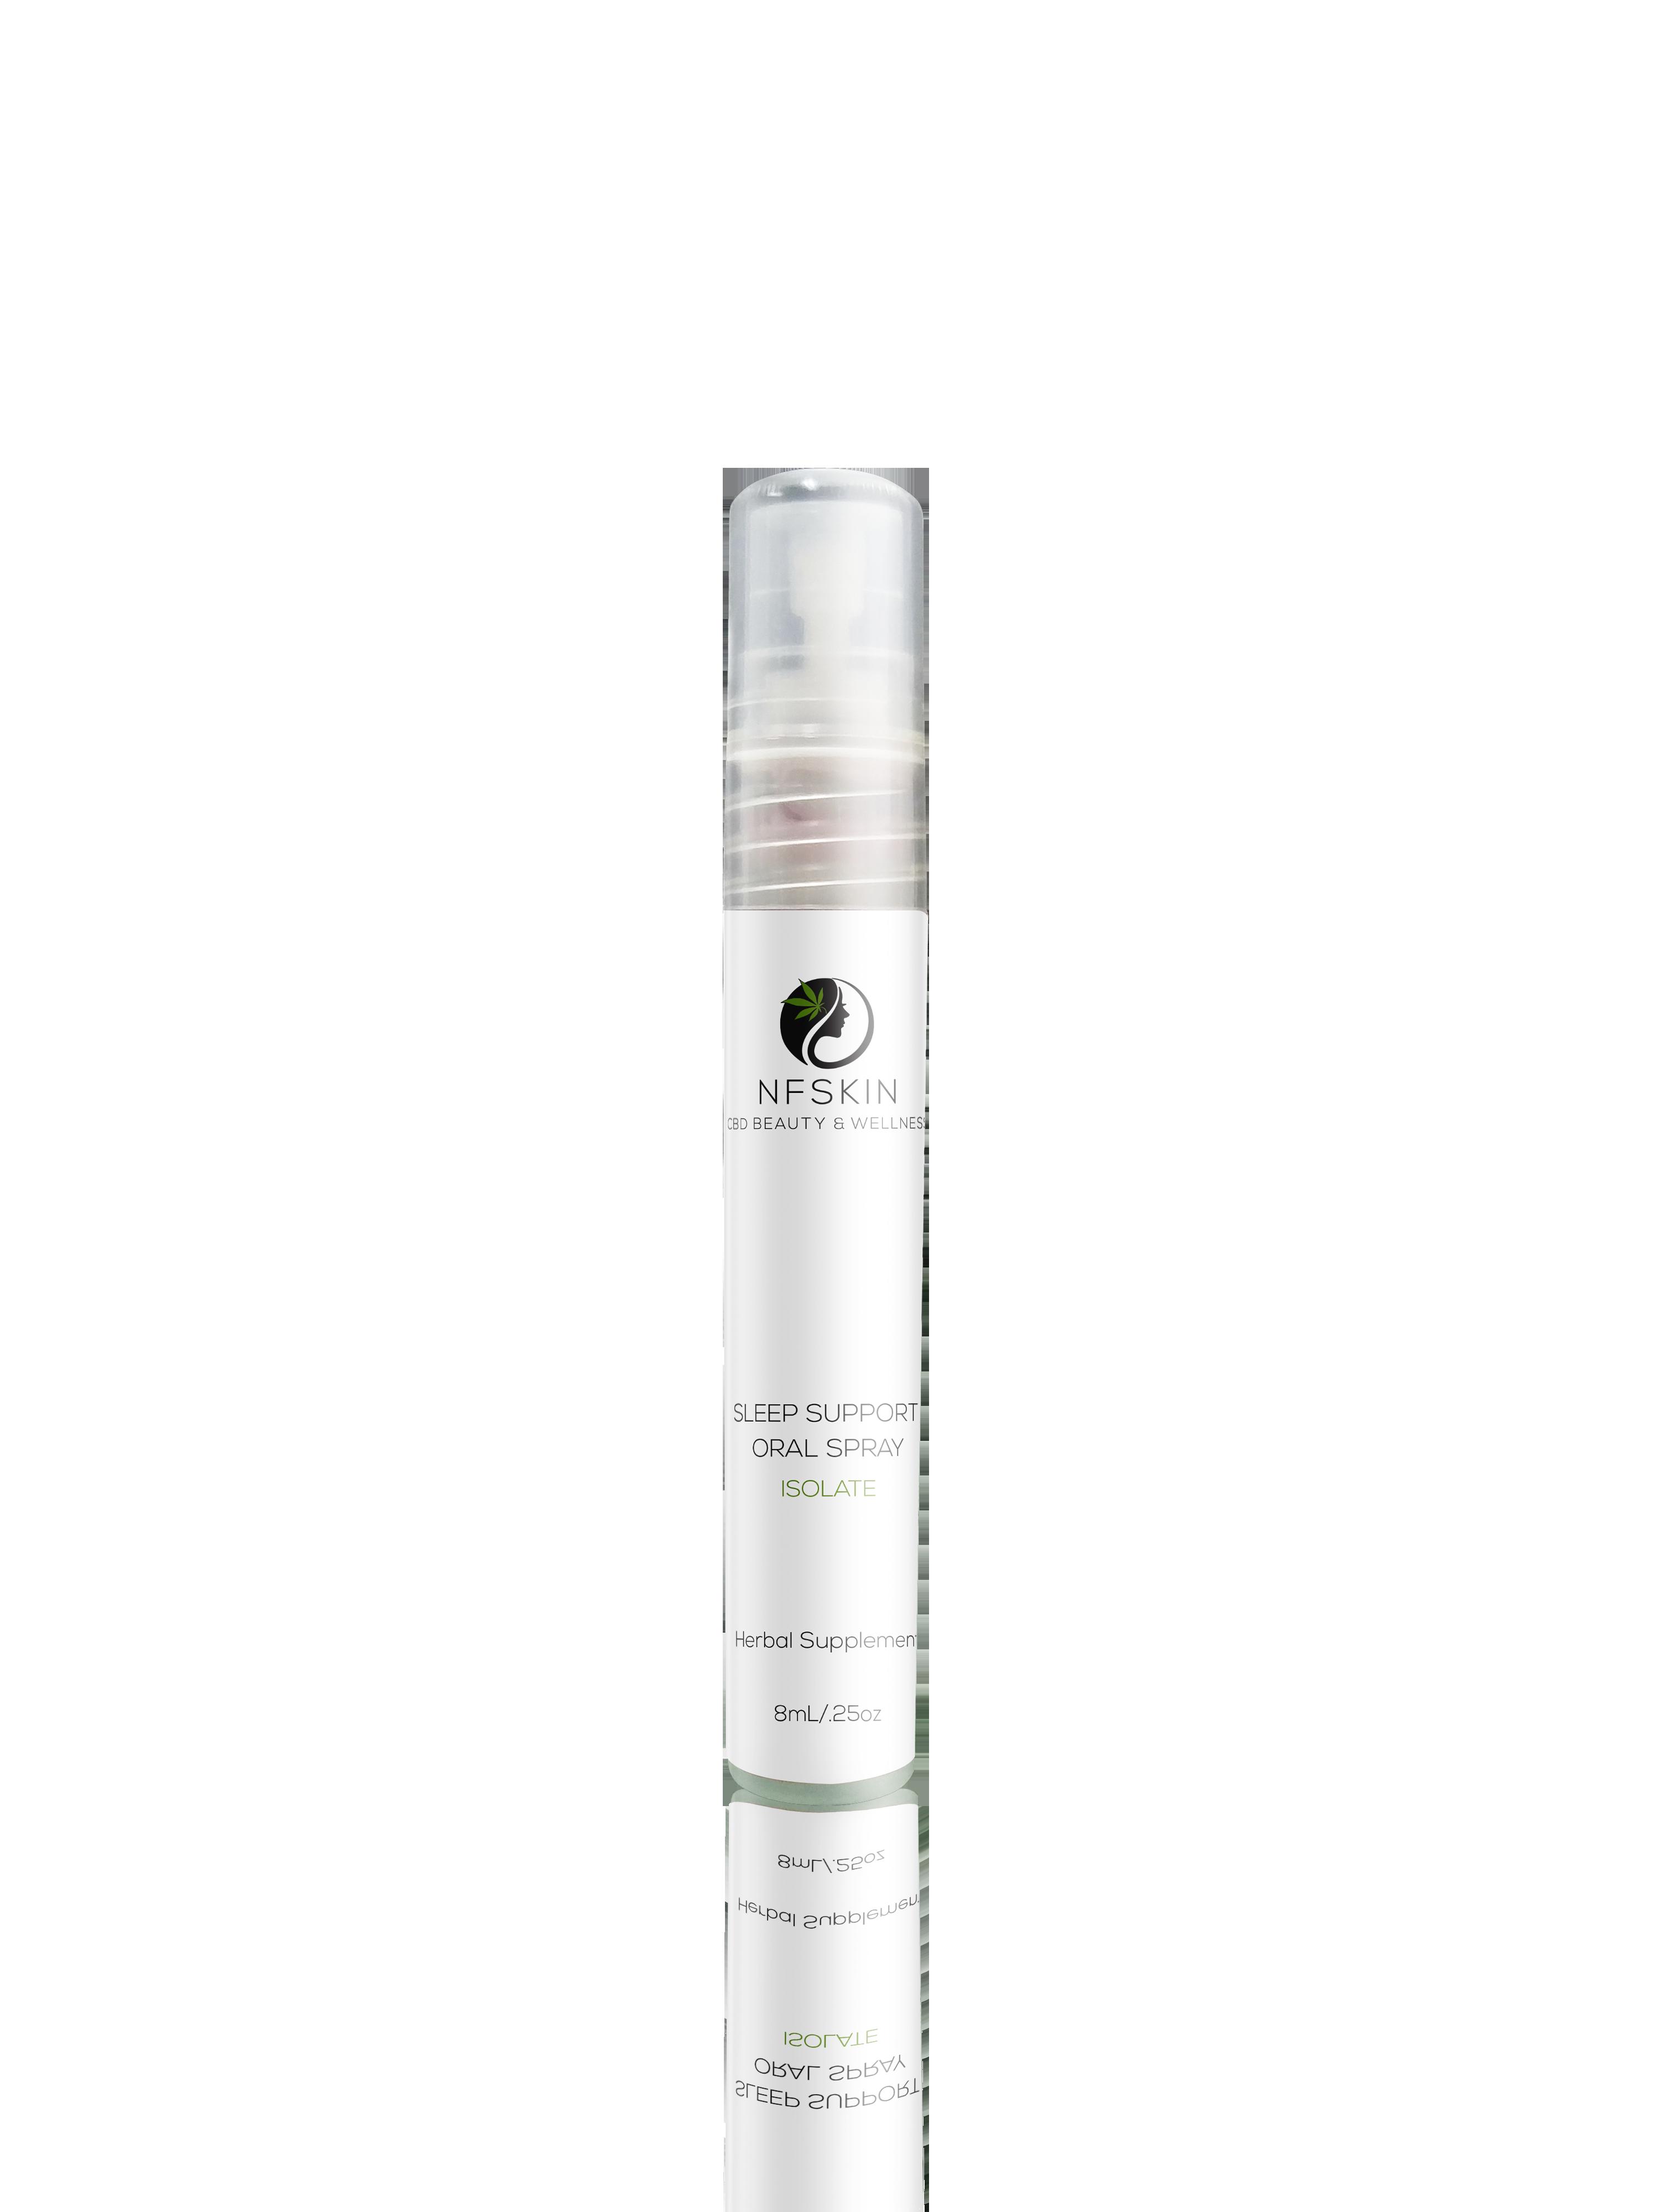 Sleep Support Oral Spray Mini